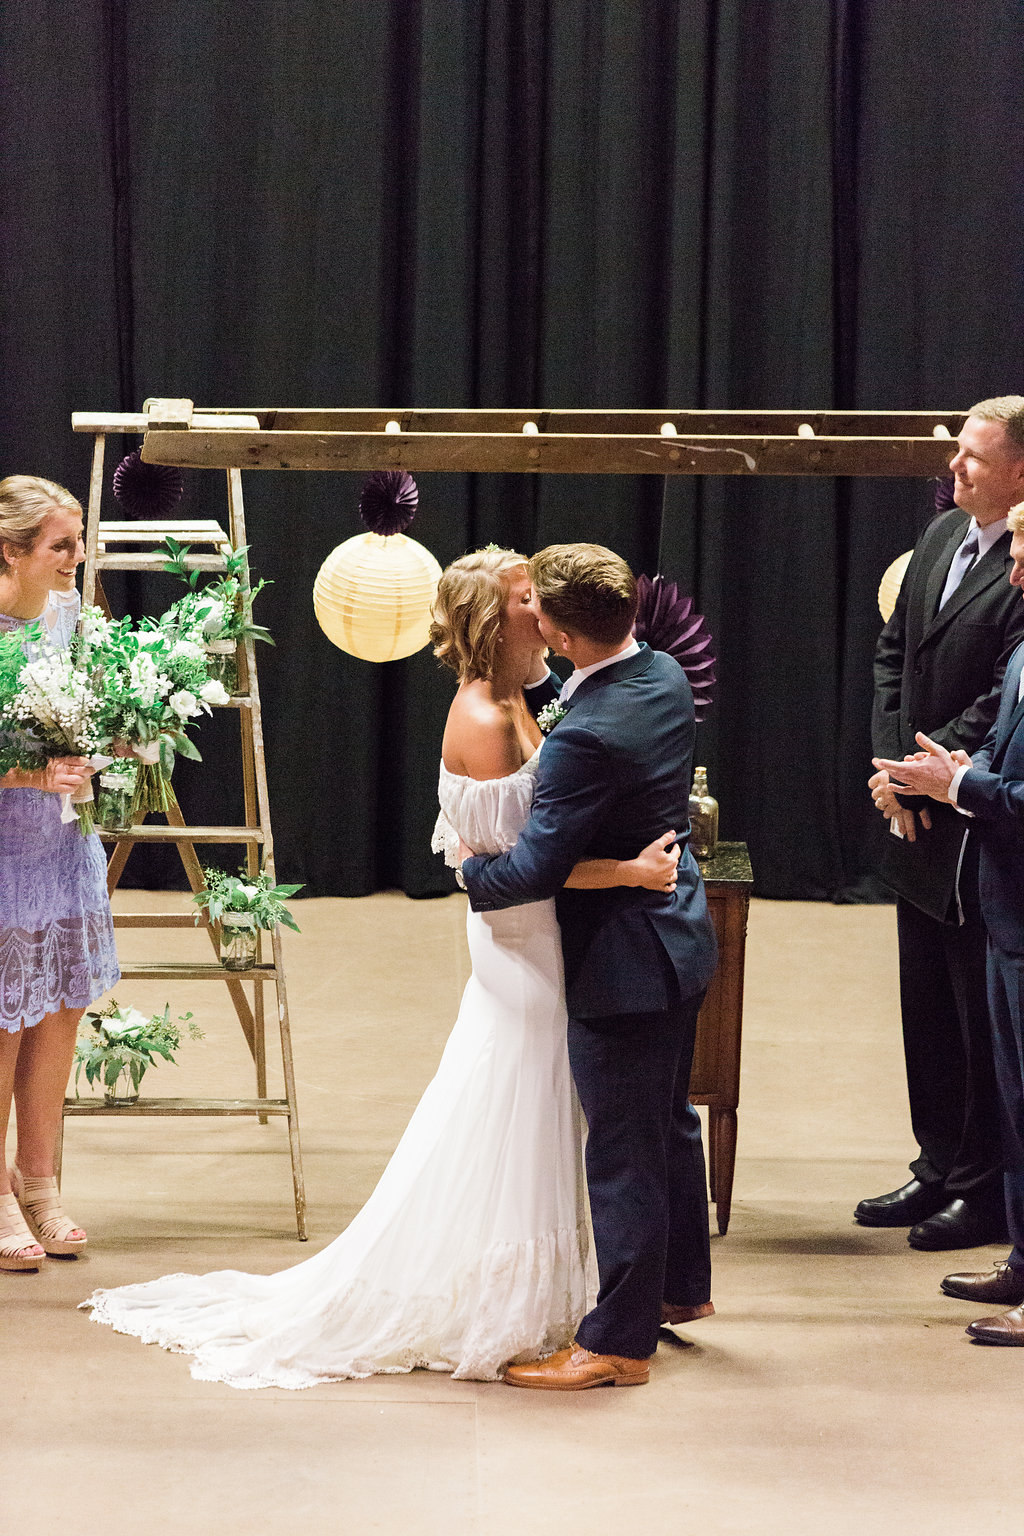 stacey-and-tj-wedding-apartment-b-photography-ivory-and-beau-bridal-boutique-savannah-wedding-dresses-daughters-of-simone-lu-boho-bride-boho-wedding-savannah-boho-wedding-savannah-weddings-savannah-bridal-gowns-savannah-wedding-39.jpg